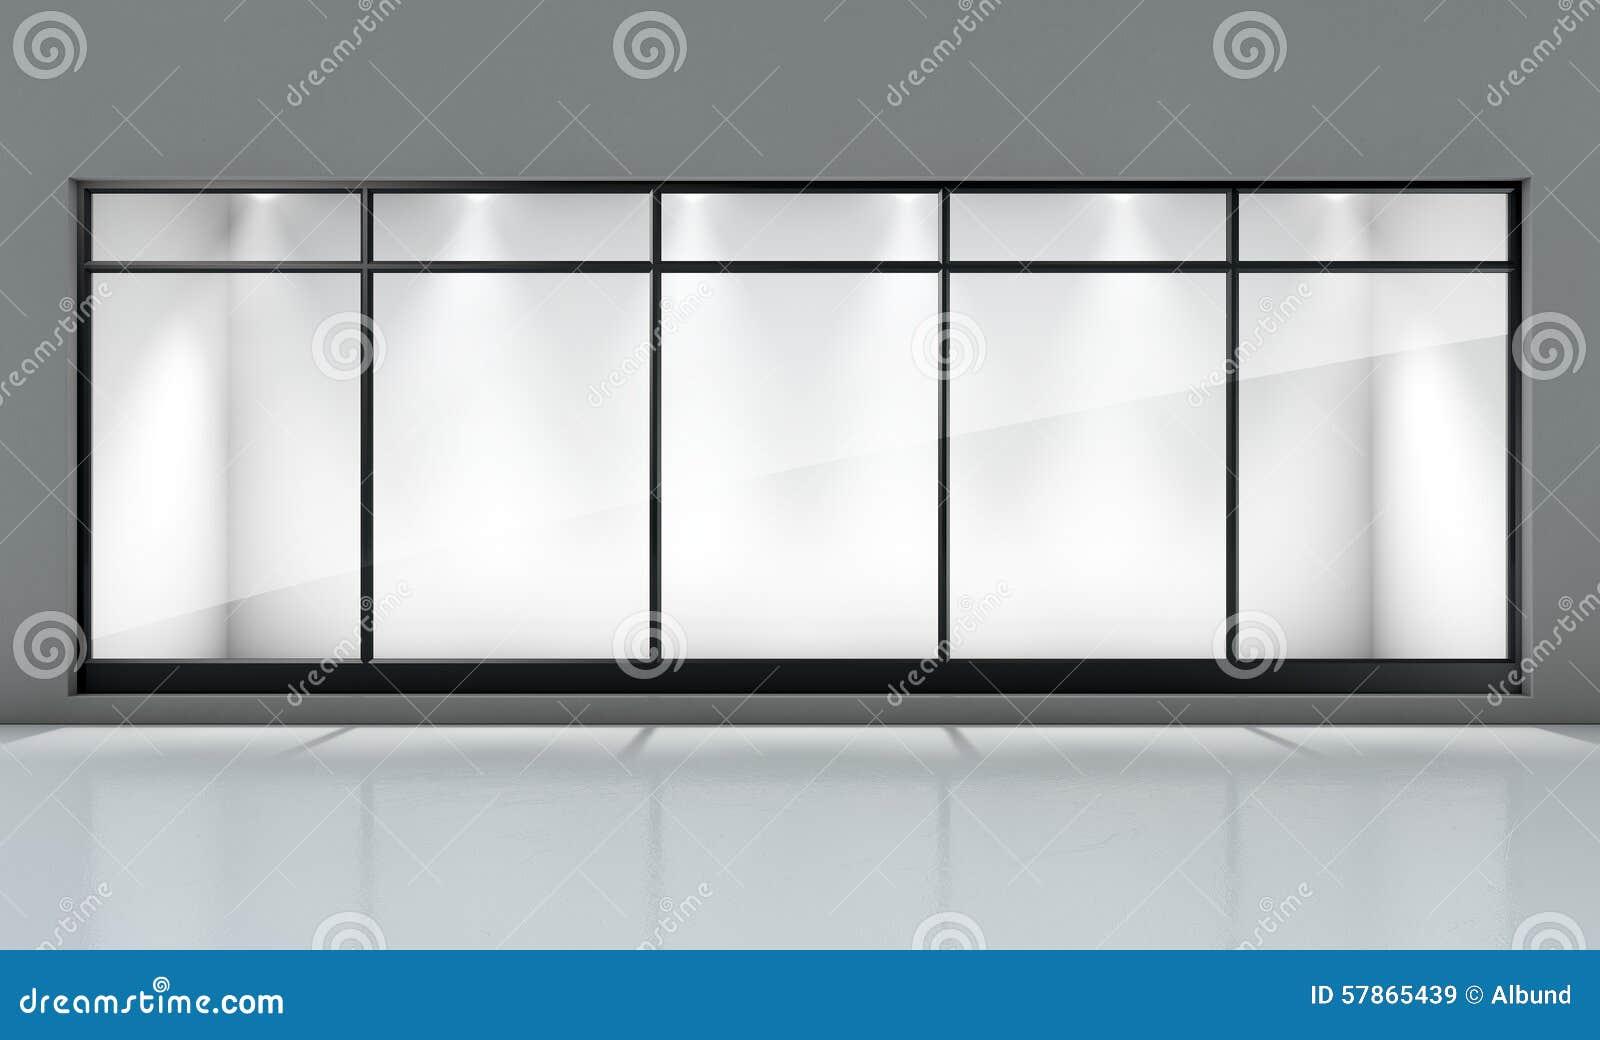 Shop Window Display Stock Photo Image 57865439